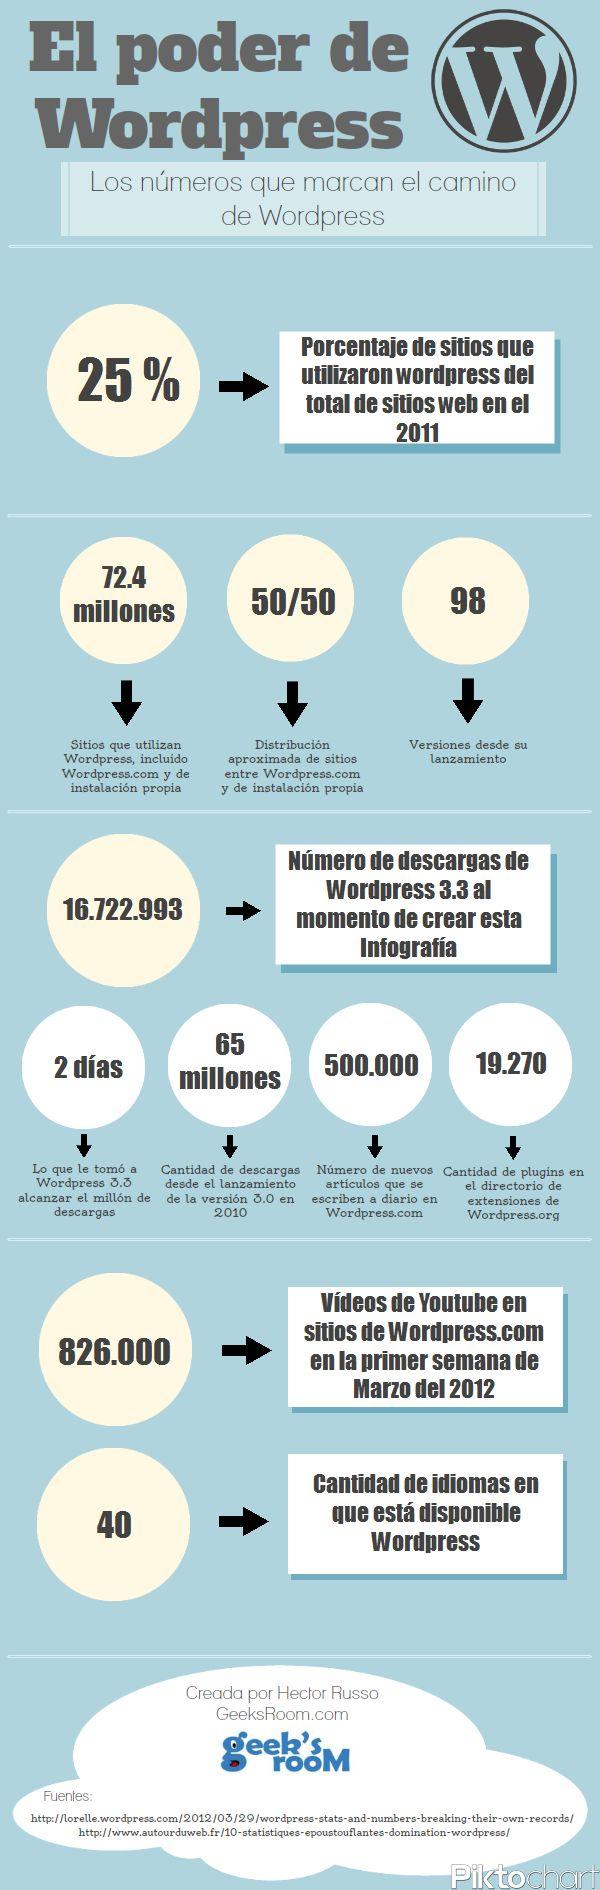 #Infografia - El poder de #WordPress, los números que marcan el camino de esta plataforma de blogs